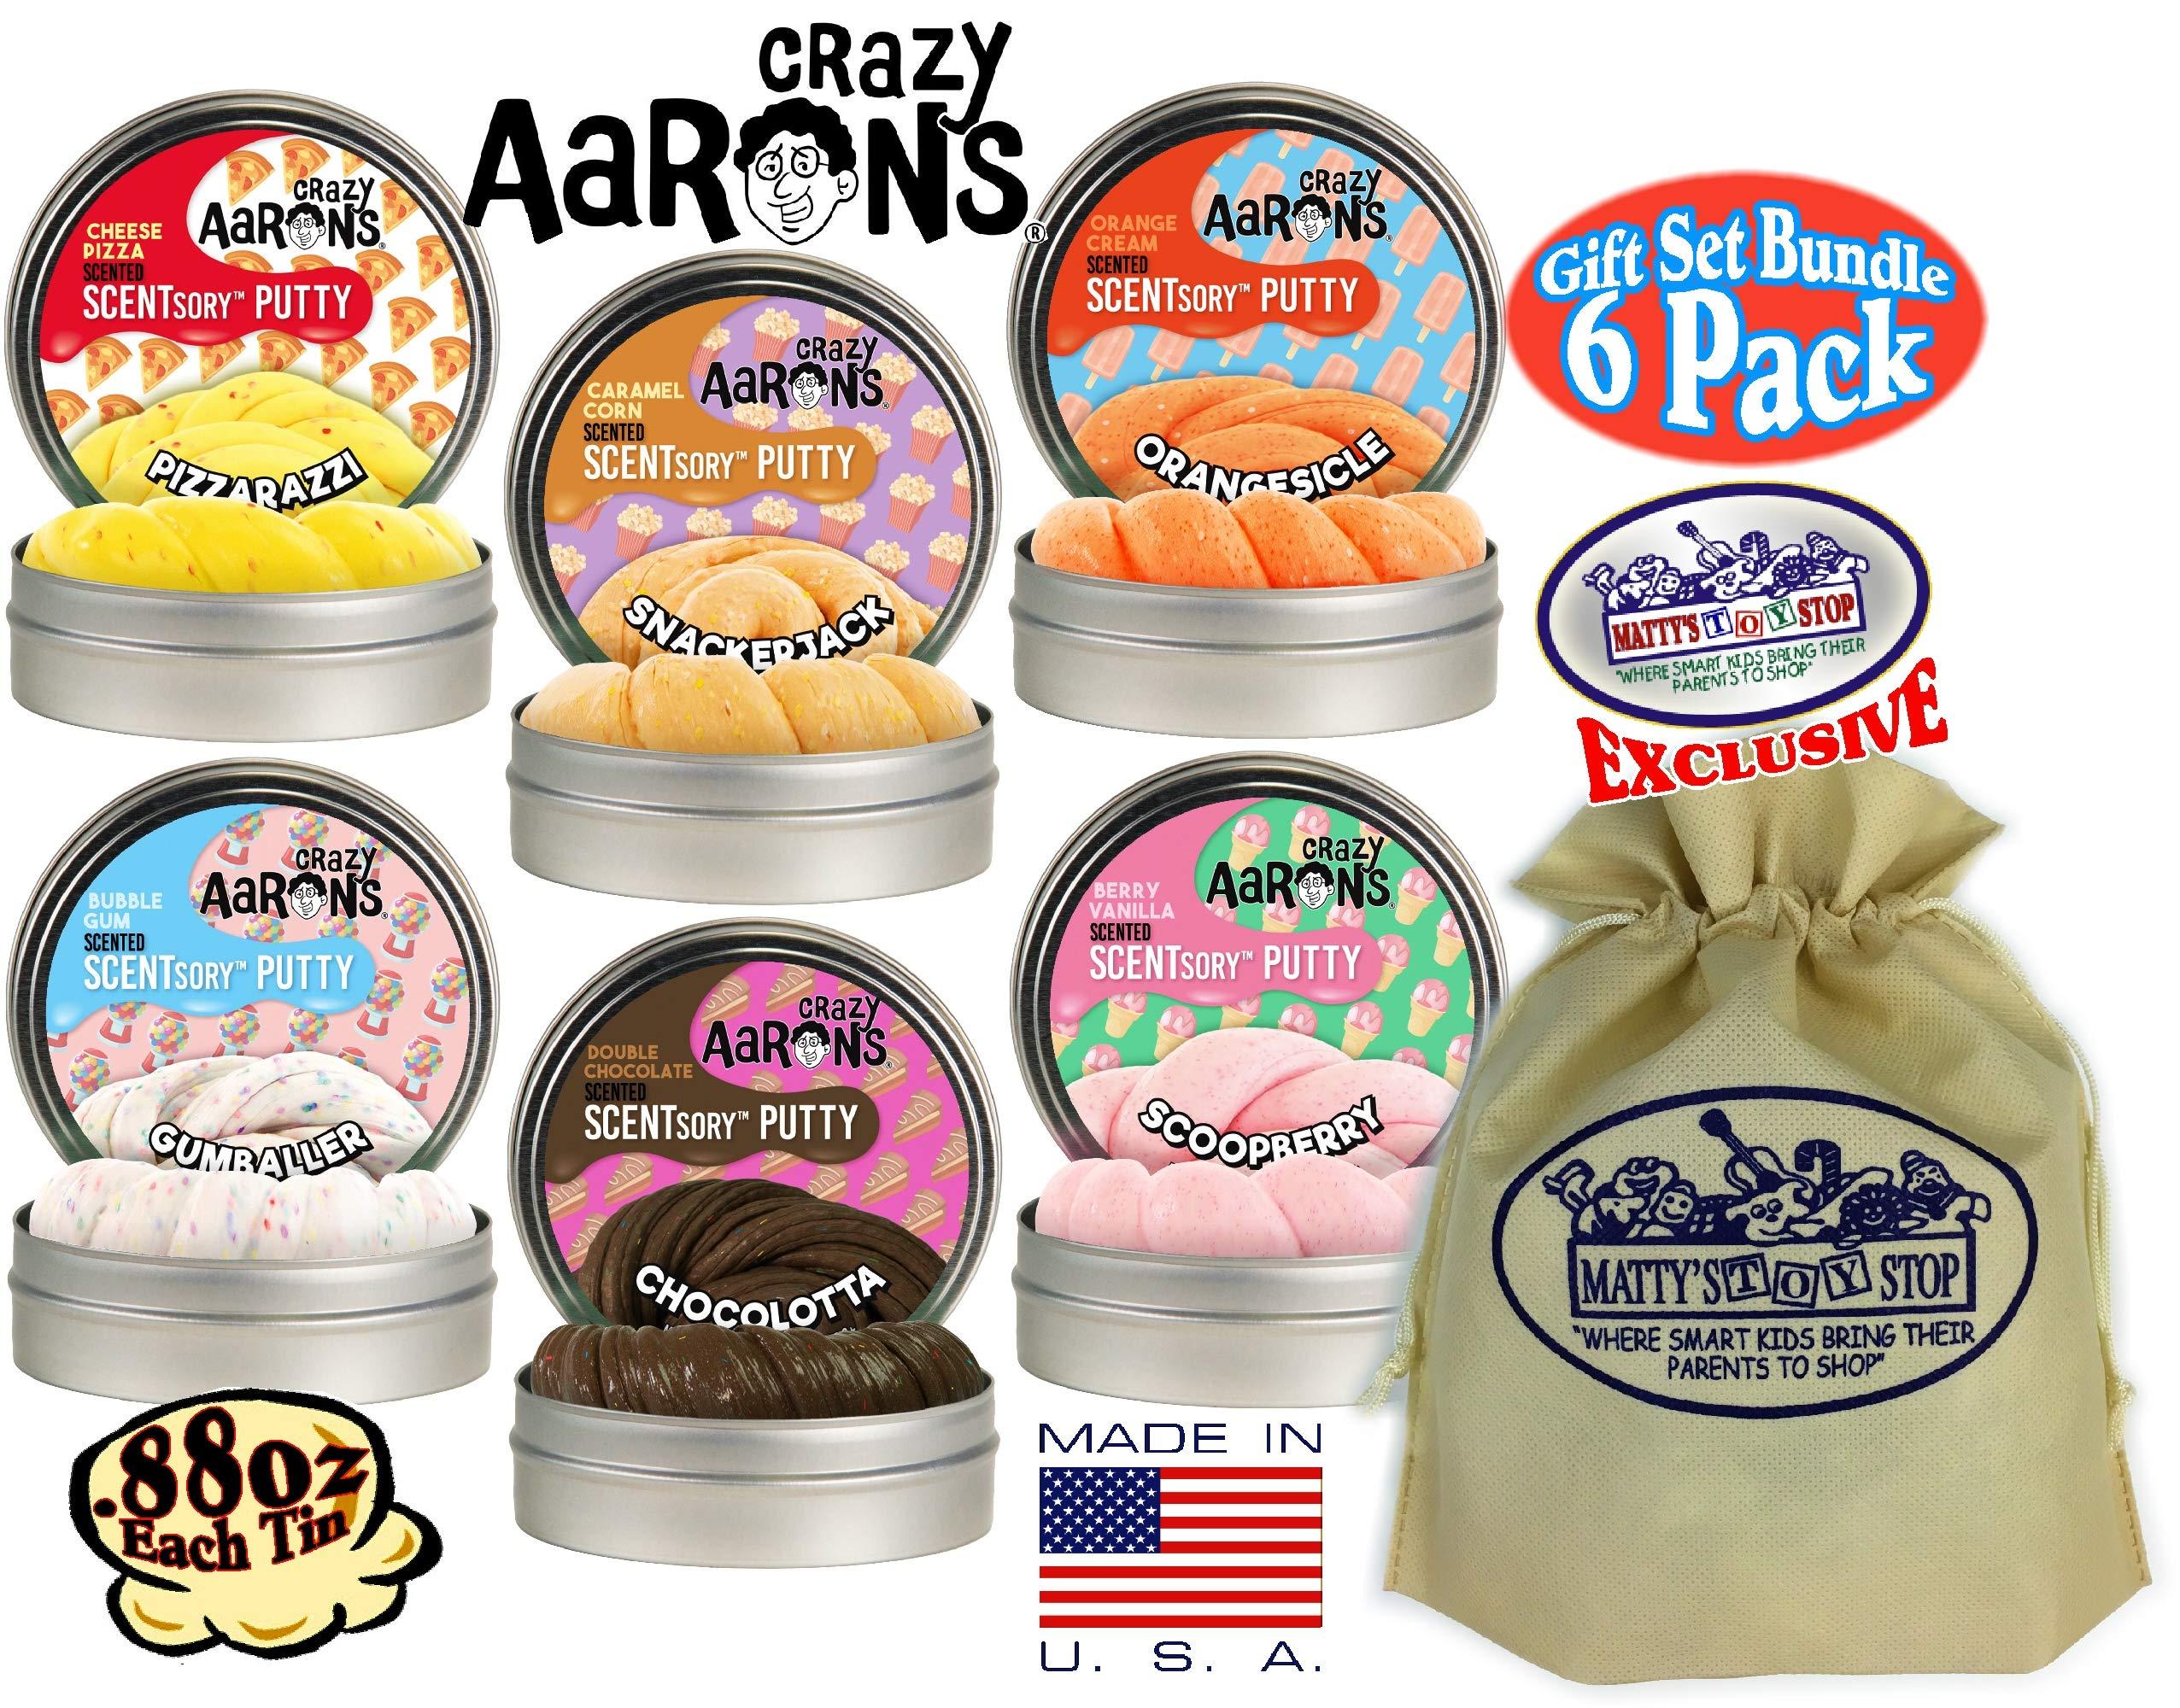 Crazy Aaron's Thinking Putty SCENTSory Tins Deluxe Gift Set Bundle Featuring Pizzarazzi, Gumballer, Chocolatta, Snackerjack, Scoopberry, Orangesicle & Bonus Matty's Toy Stop Bag - 6 Pack (.88 oz each)